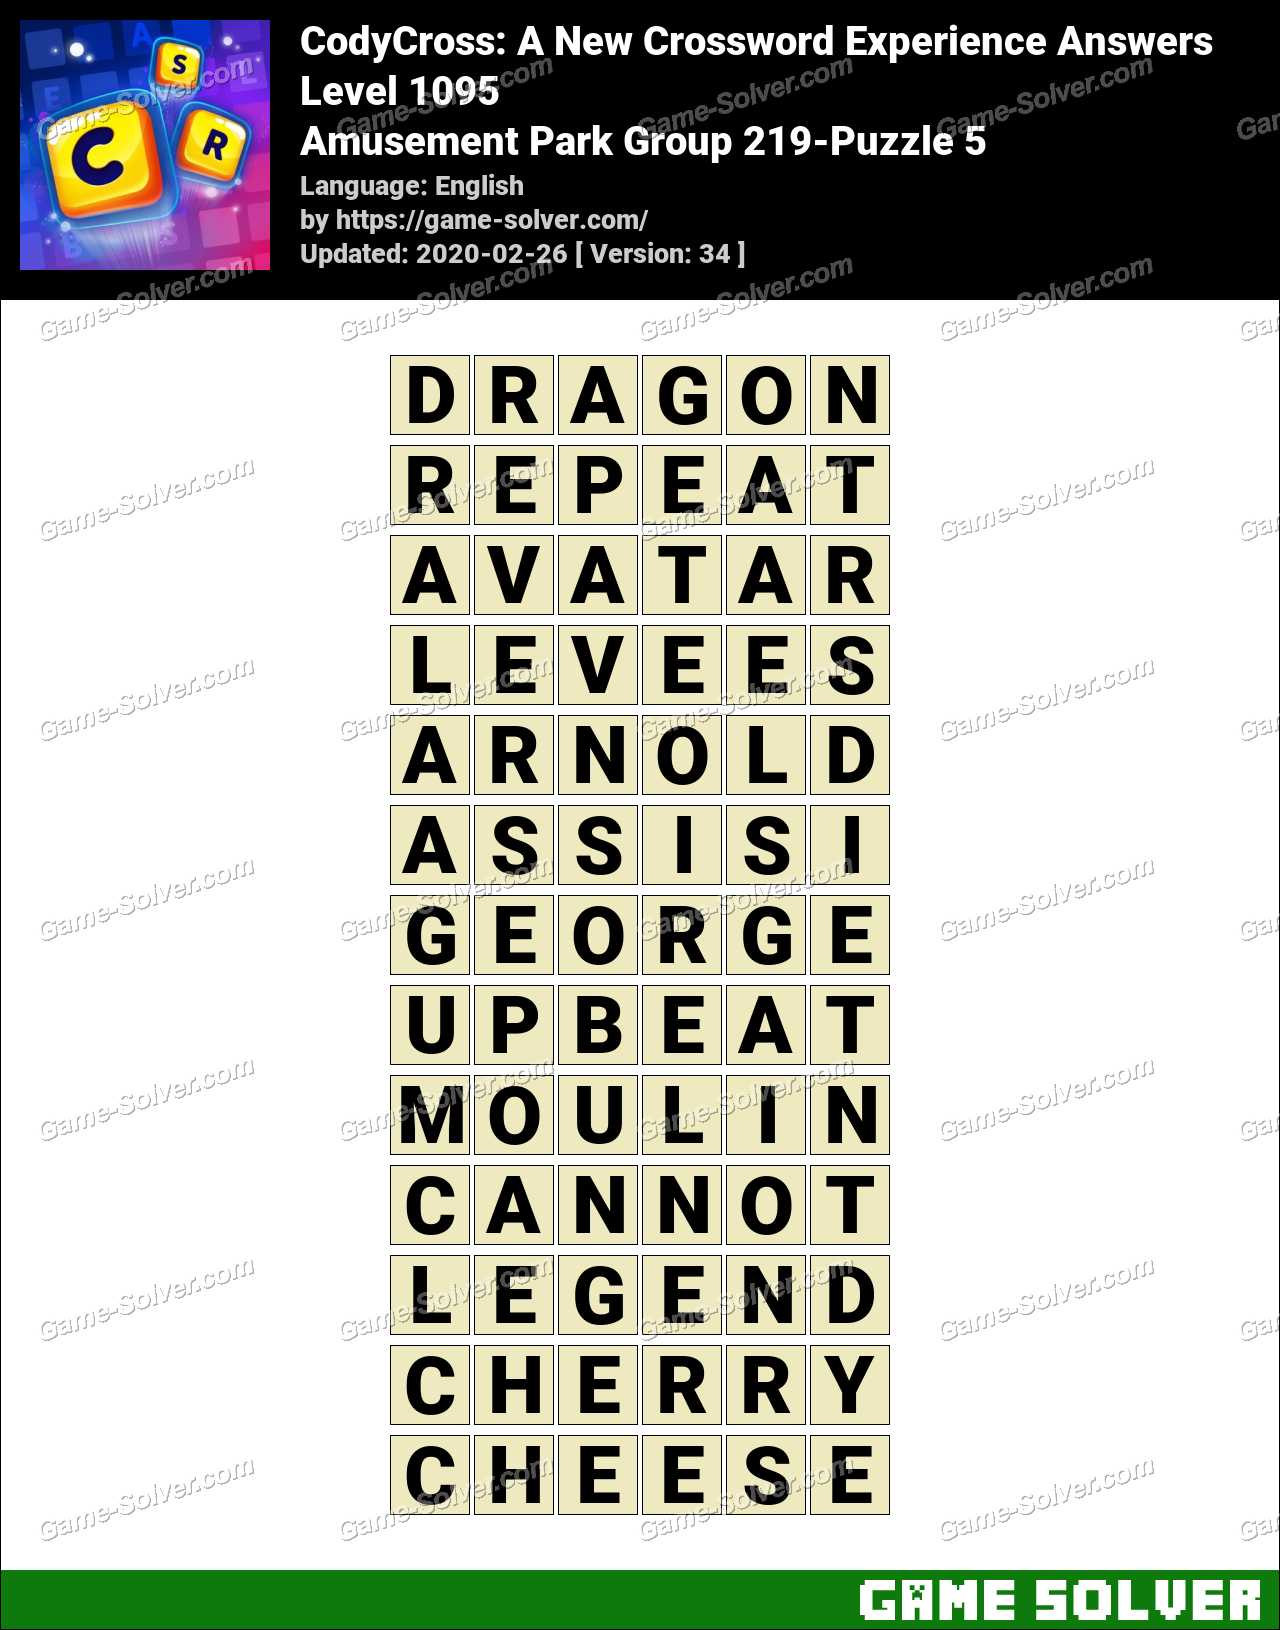 CodyCross Amusement Park Group 219-Puzzle 5 Answers